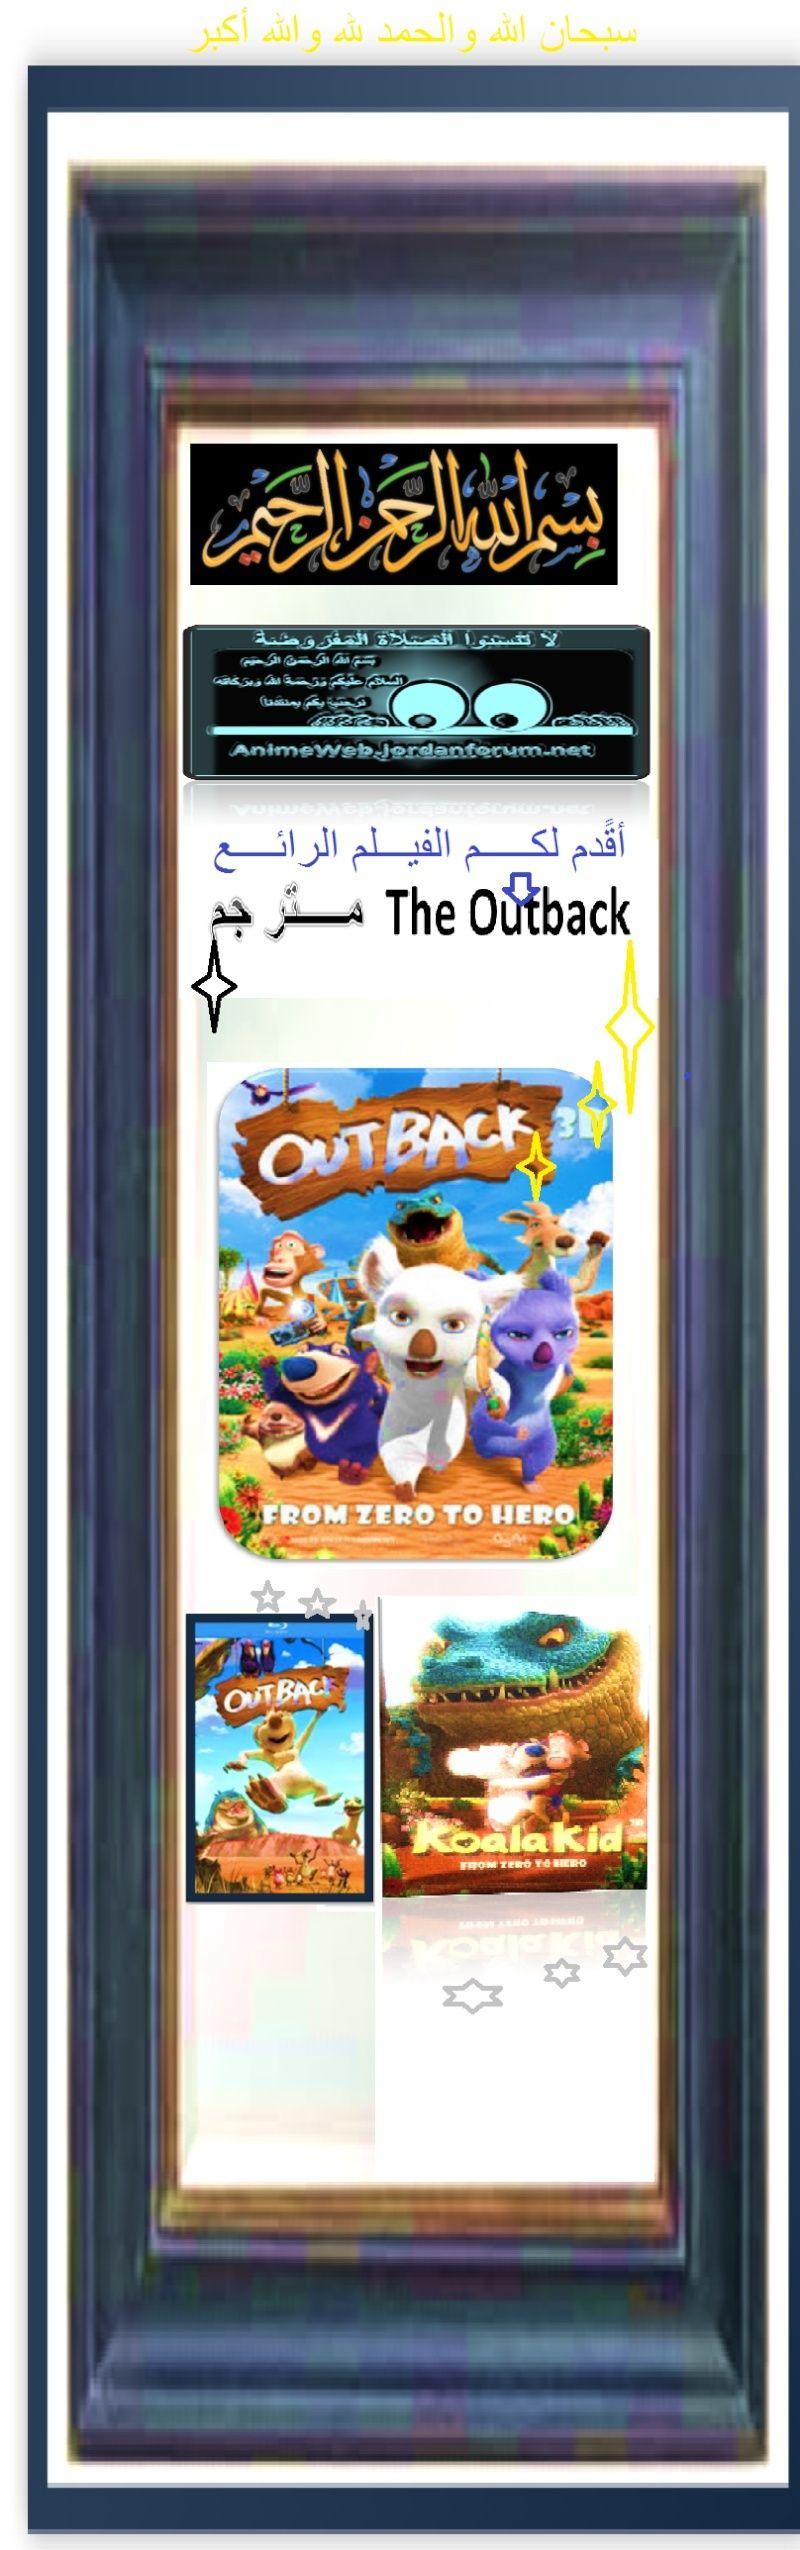 الفيلم الرائع والممتع the outback  Ououso12